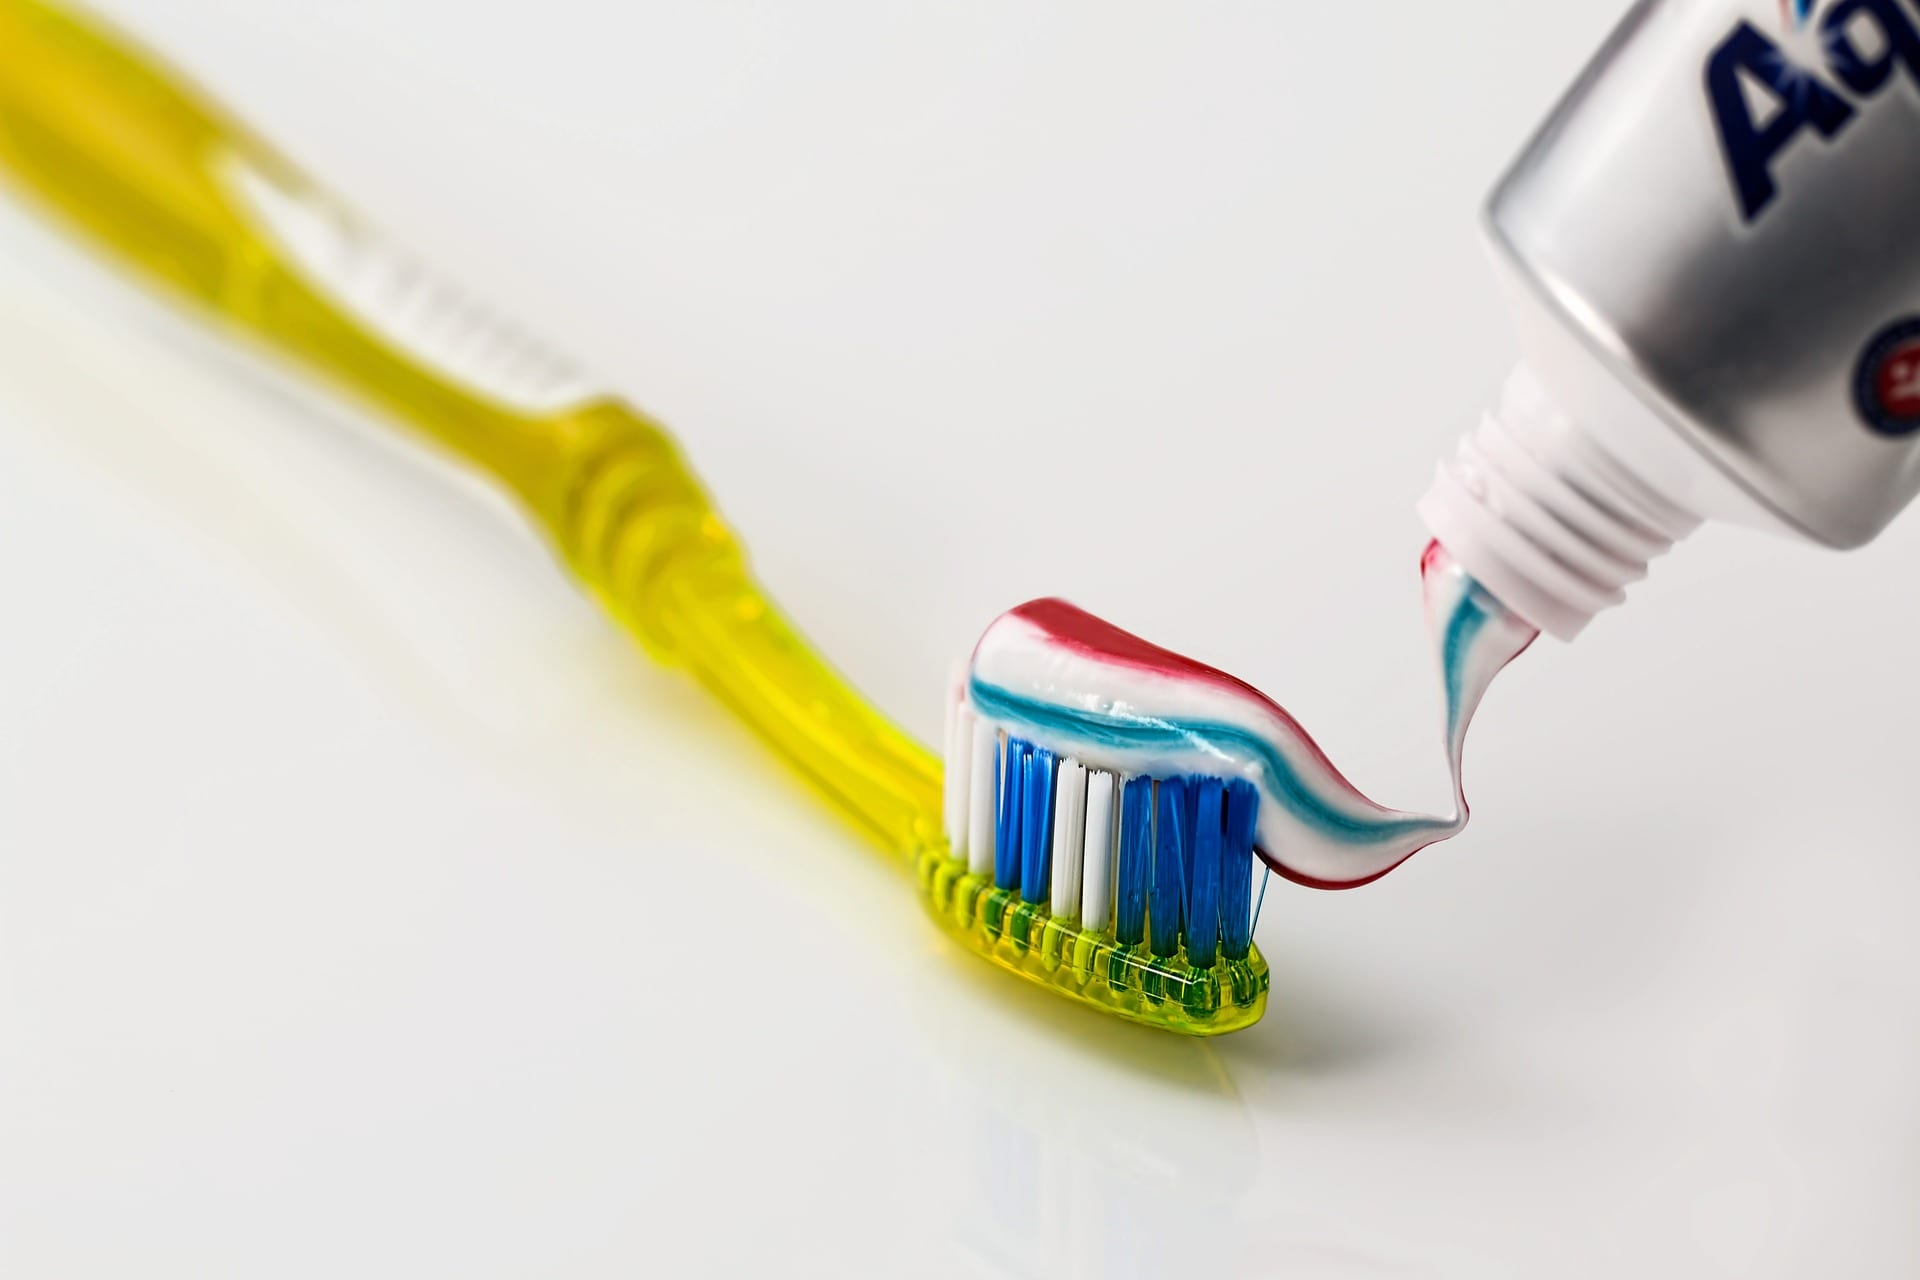 dentures hygiene care